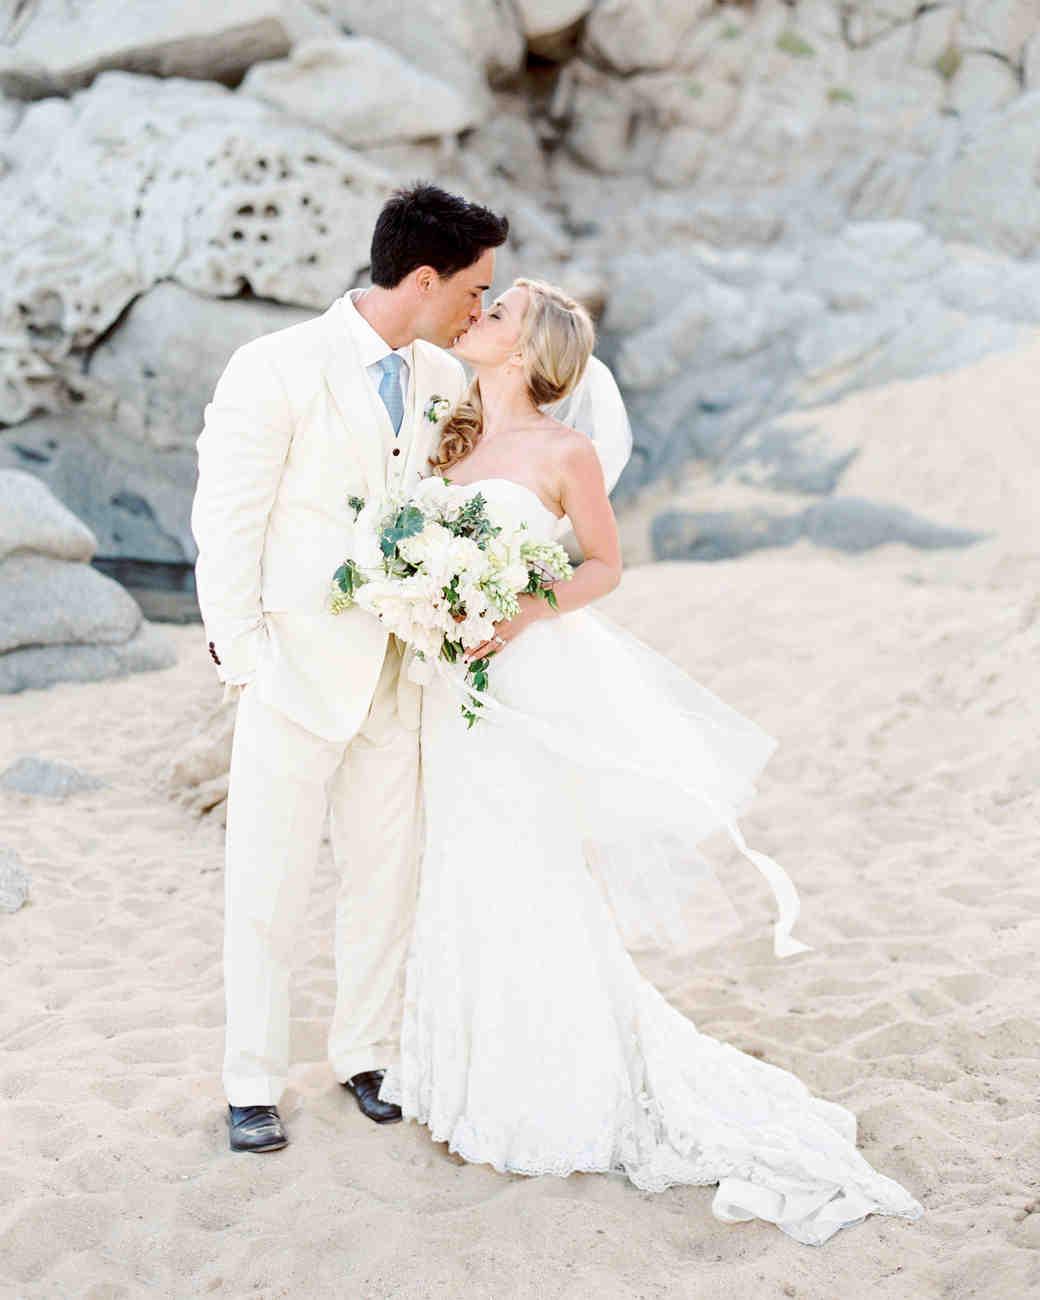 megan-jeremy-wedding-couple-53-s112680-0216.jpg